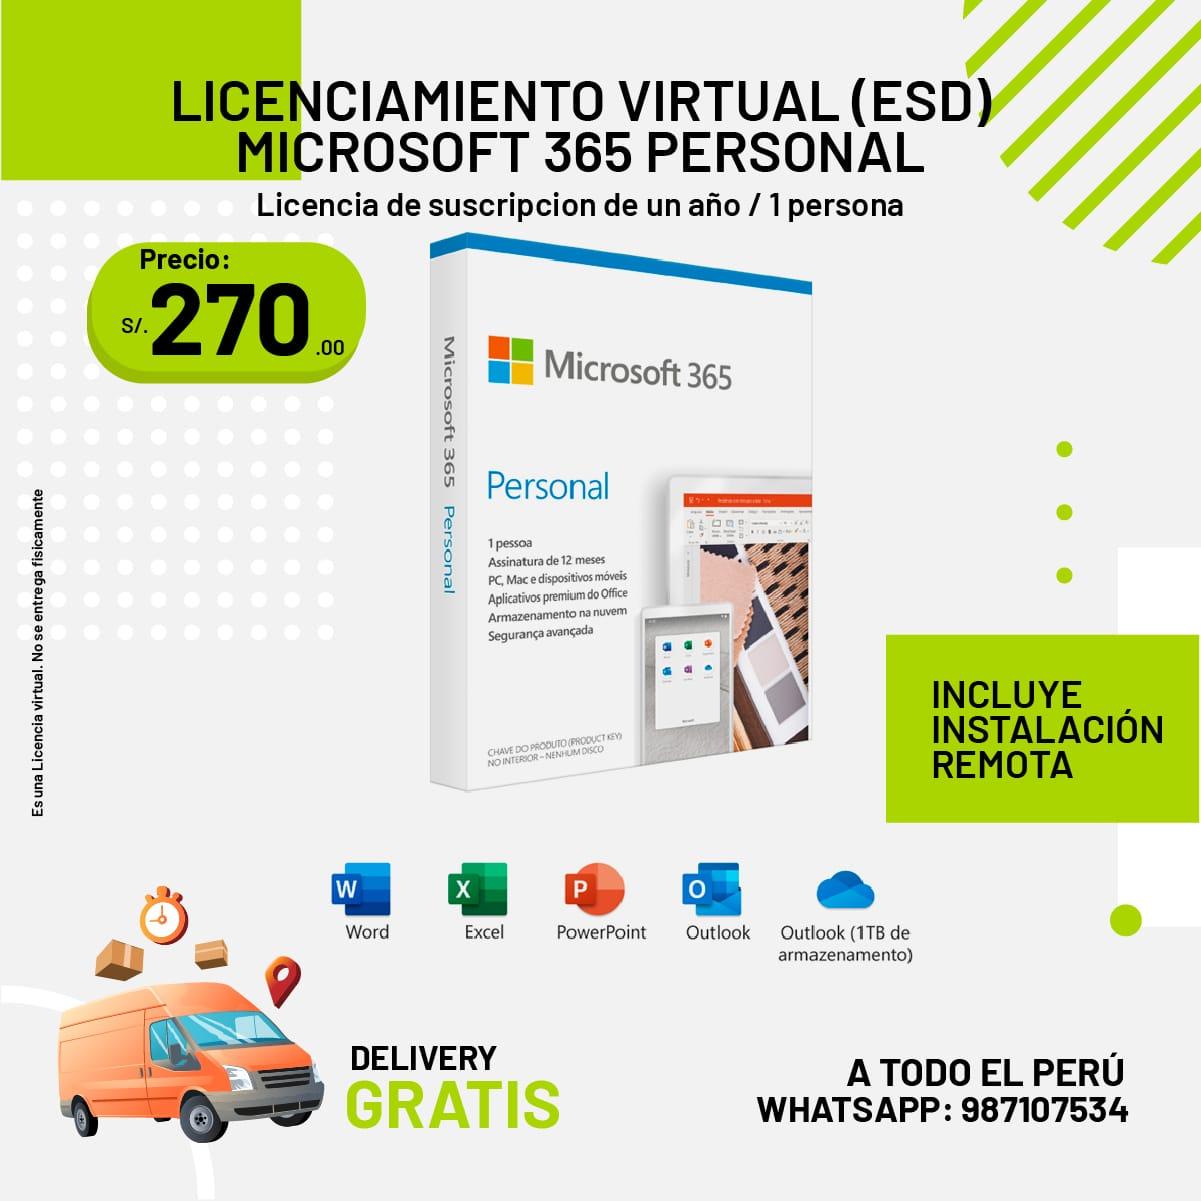 Licenciamiento Virtual Microsoft 365 Personal